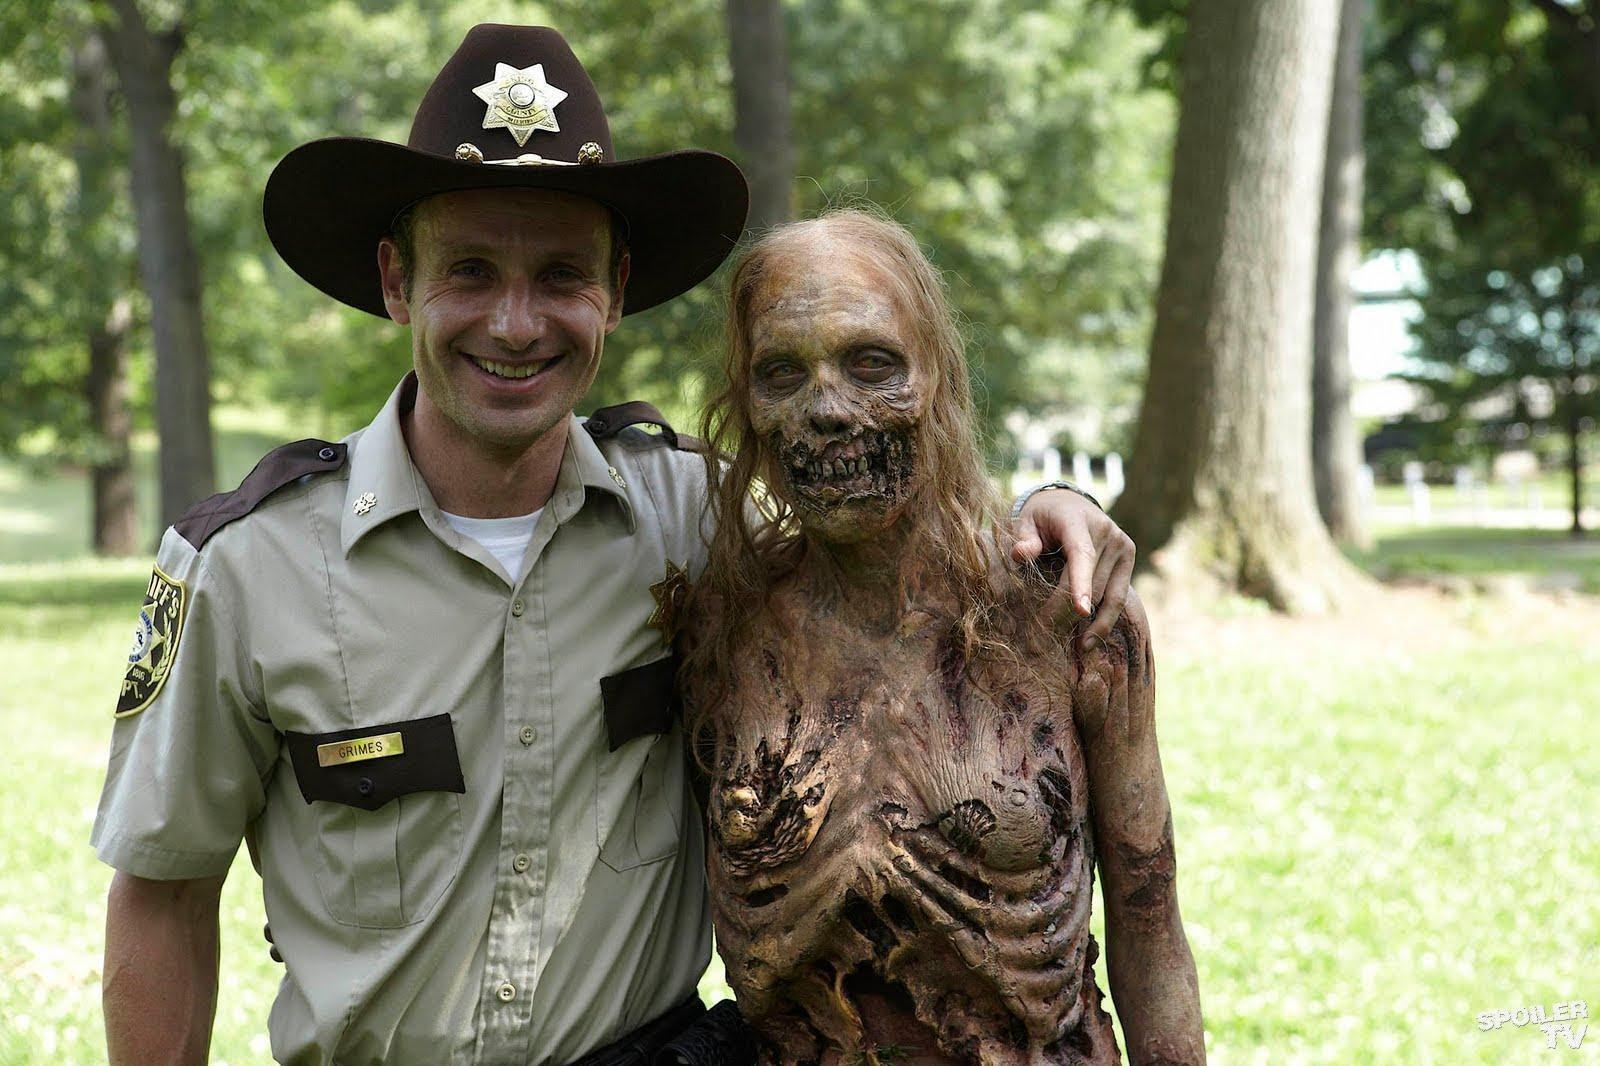 Runner Cast – The Walking Dead